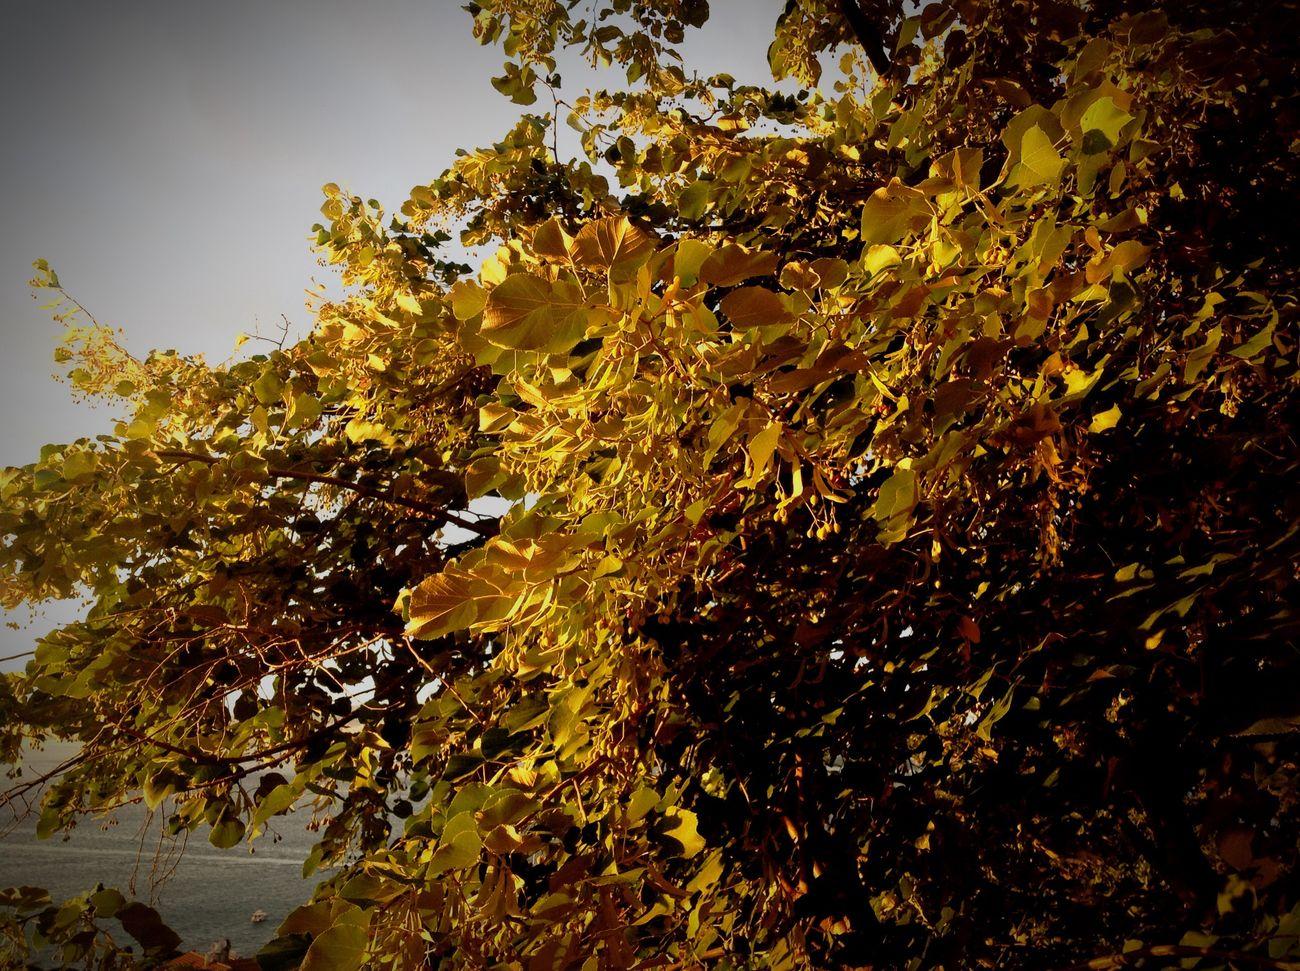 Istanbul Büyükada Nature Light Sunset Linden Tree